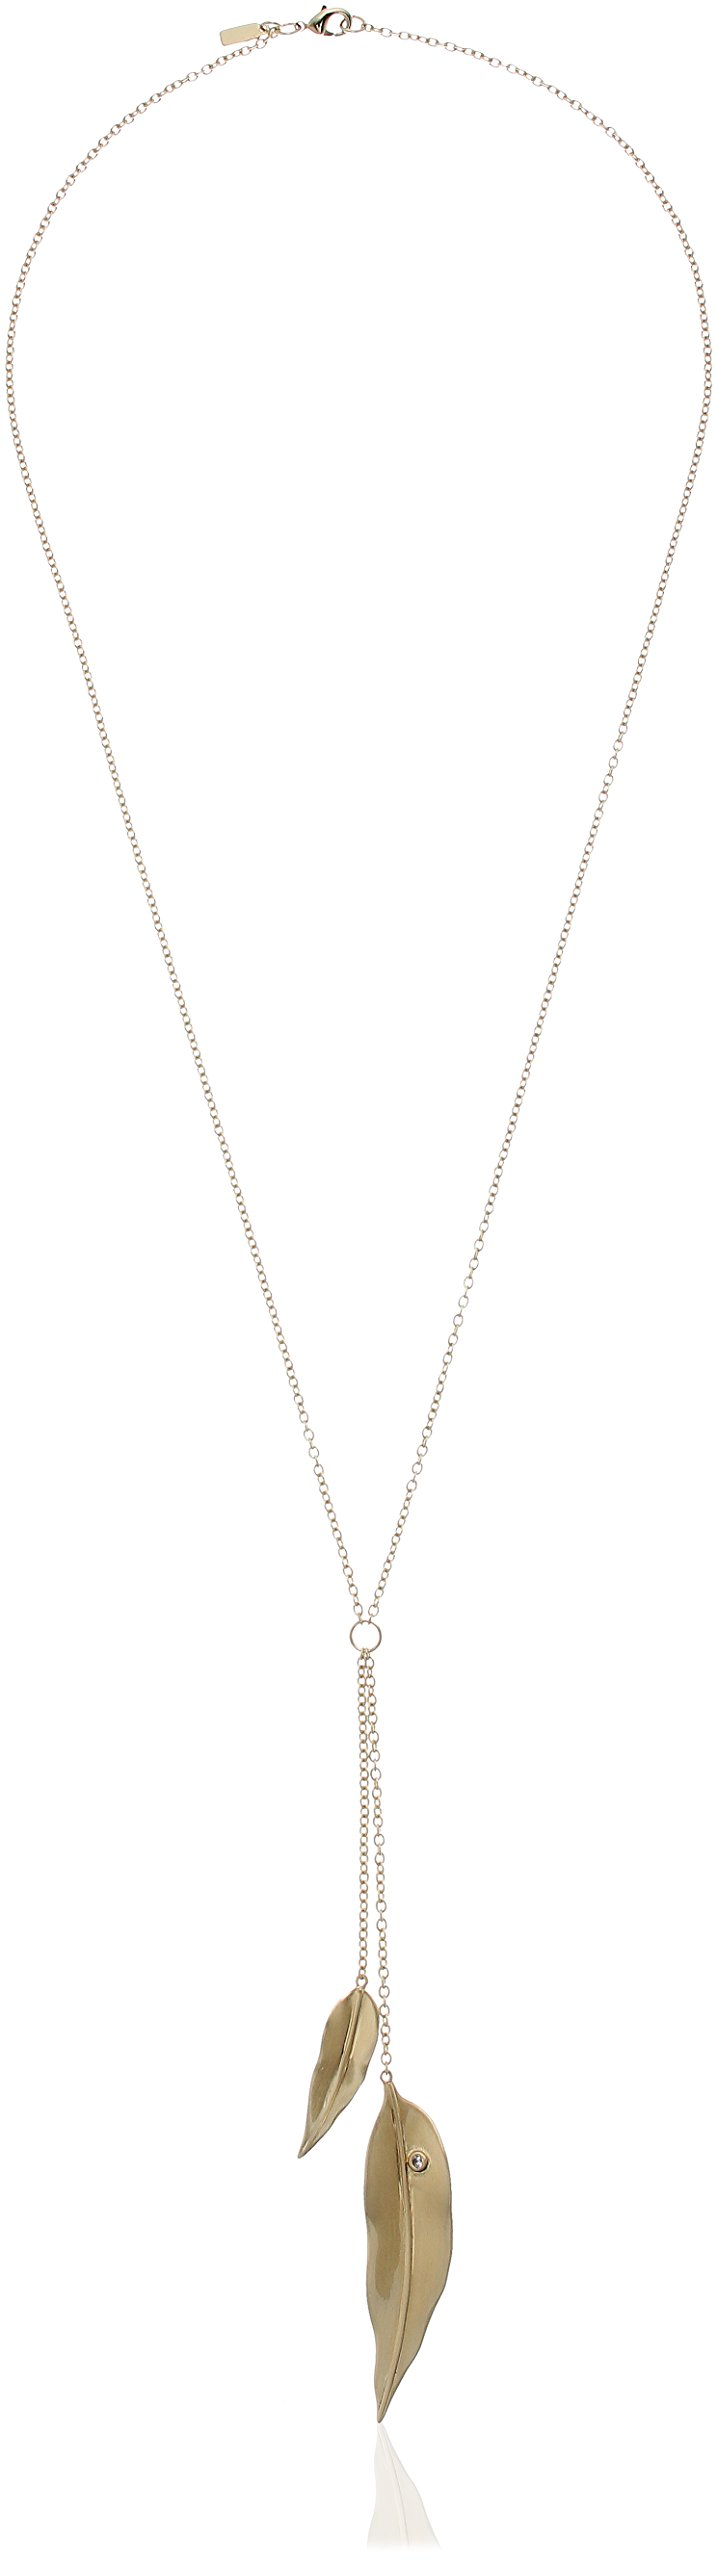 Elizabeth And James Lillia Lariat Y Shaped Necklace, Gold